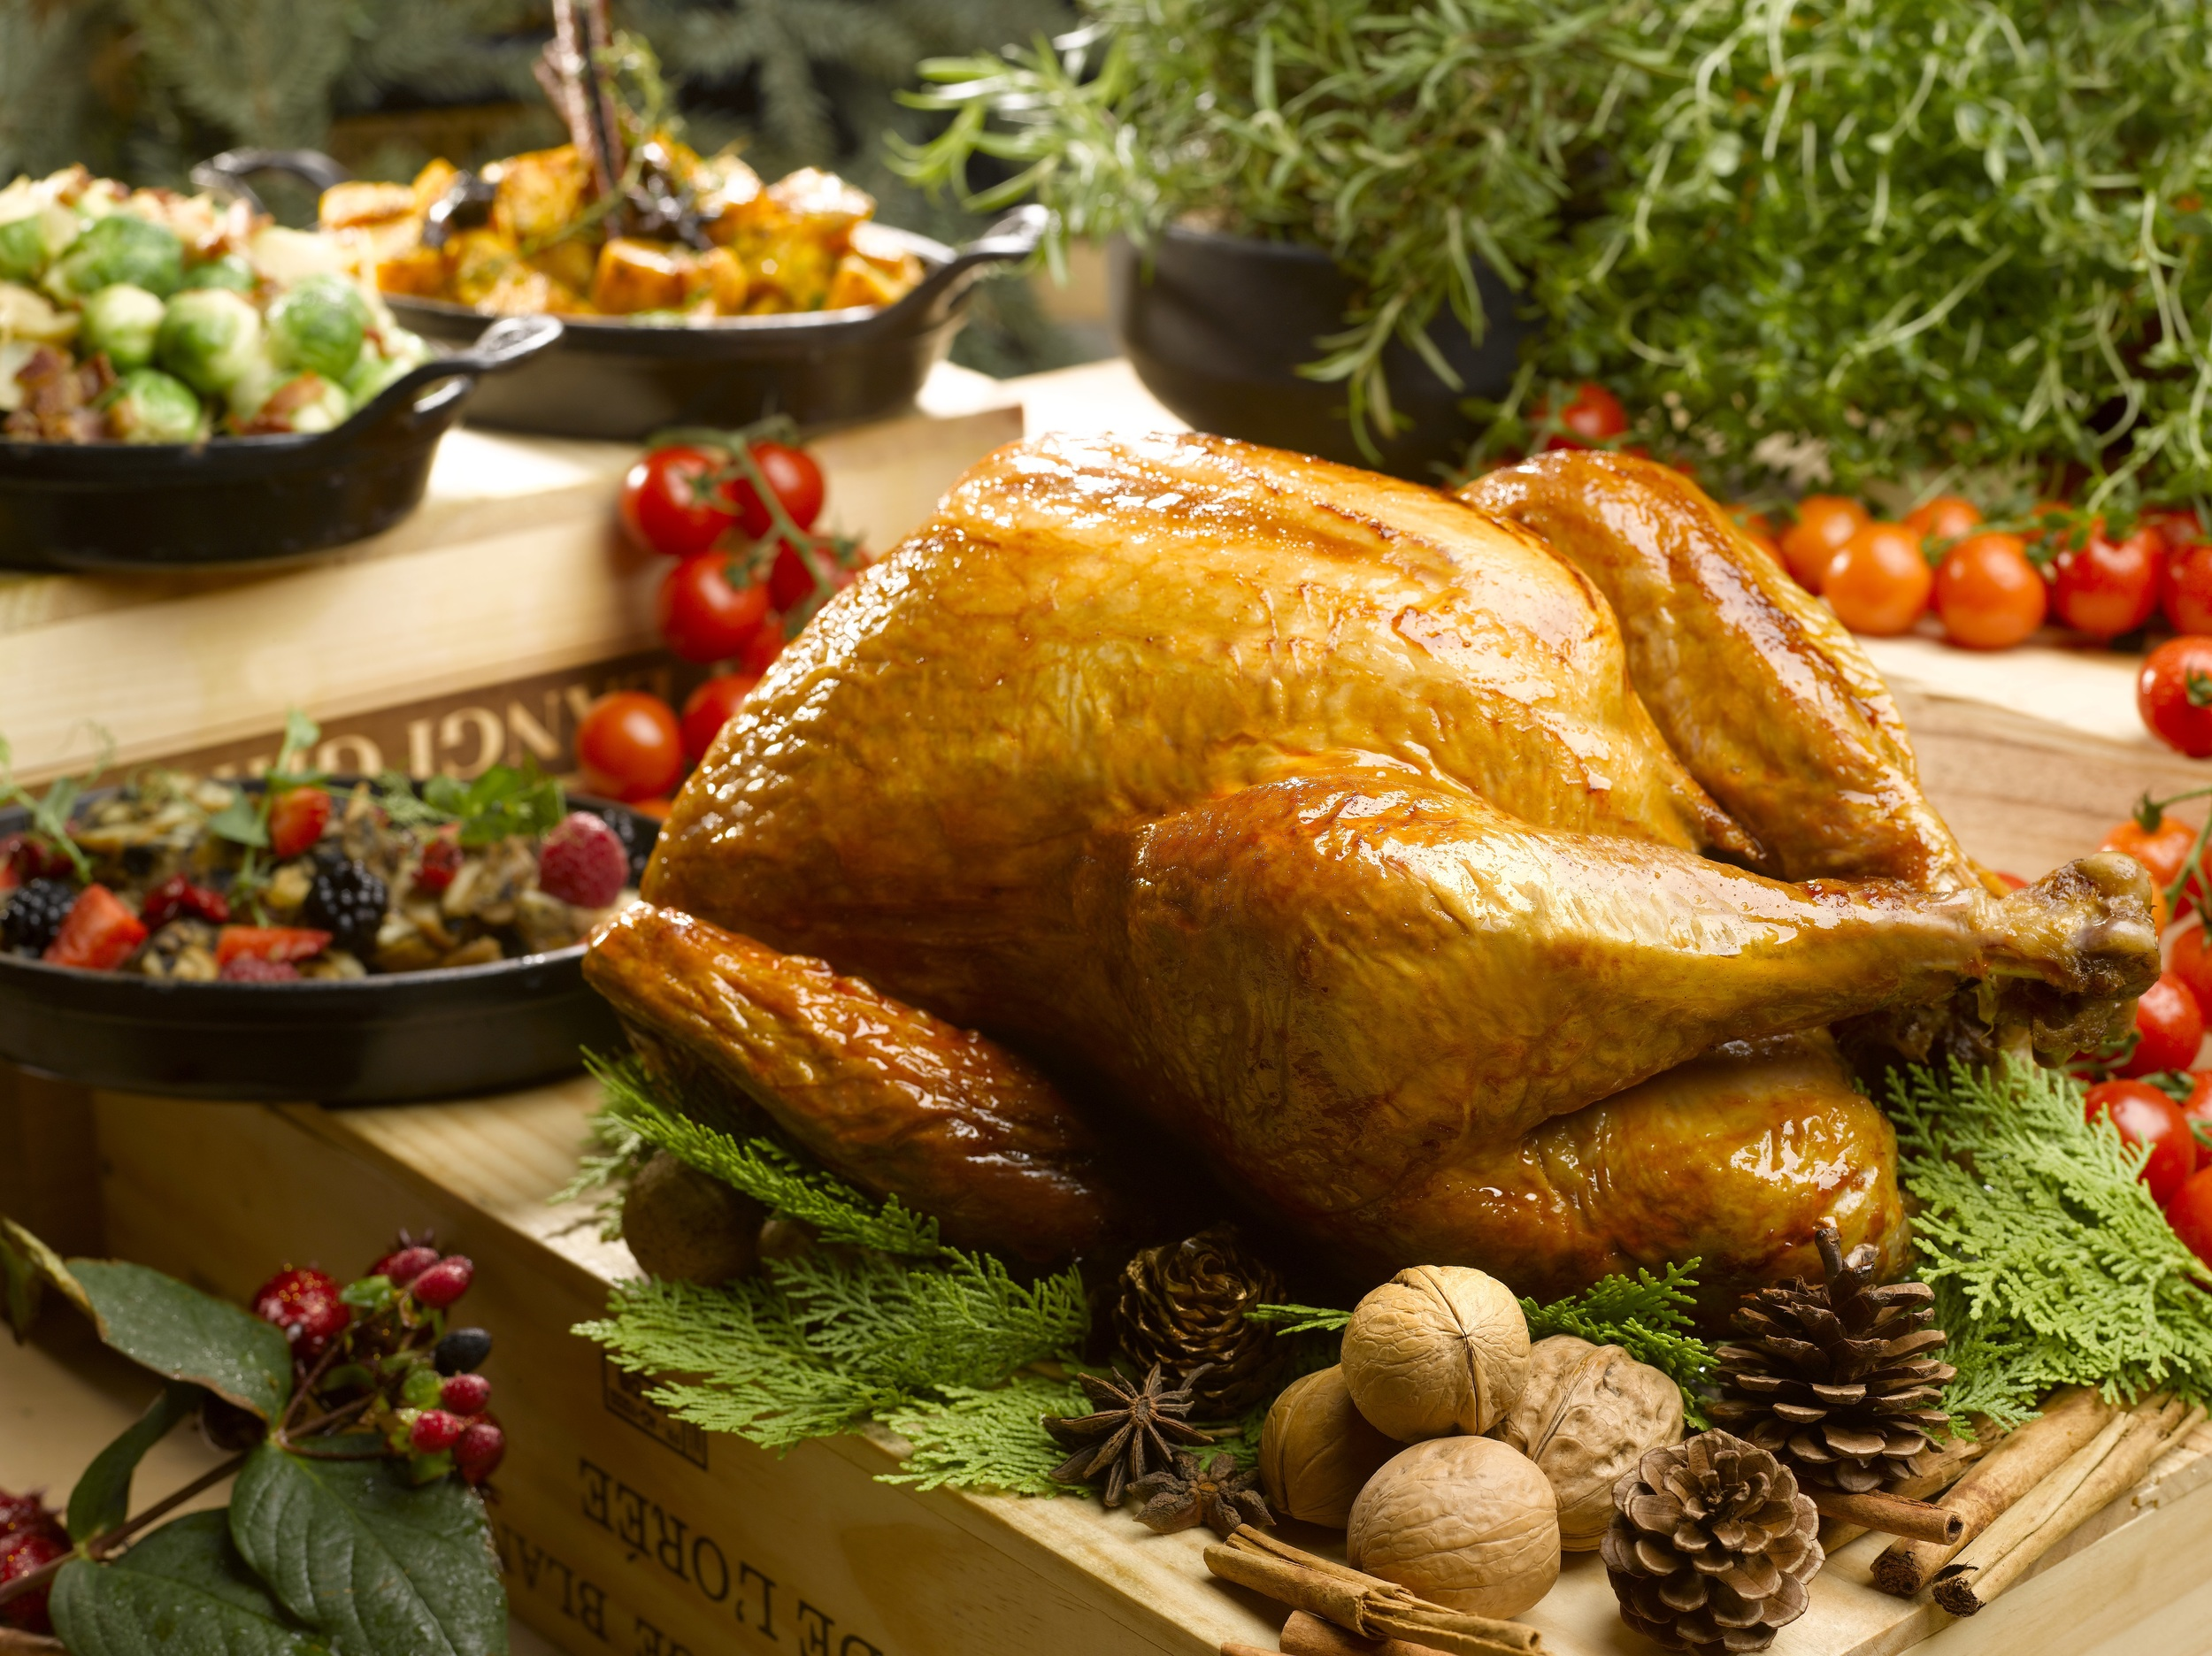 Traditional Roasted Christmas Turkey | Photo Credit: Mandarin Oriental, Singapore